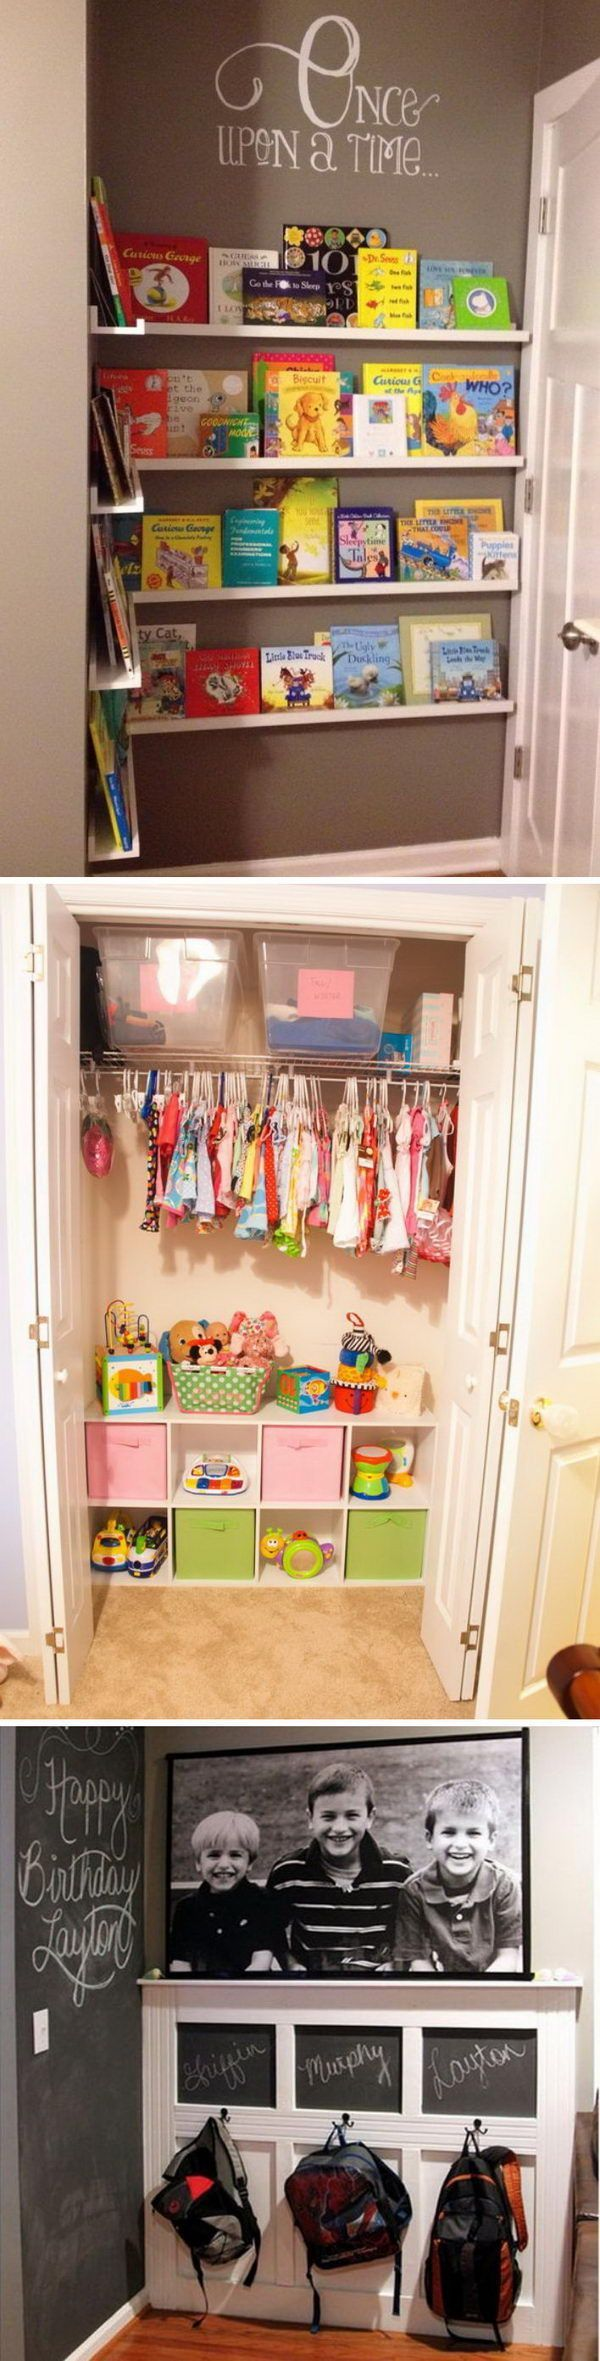 Best 25 organize kids closets ideas on pinterest for Kids room organizing ideas